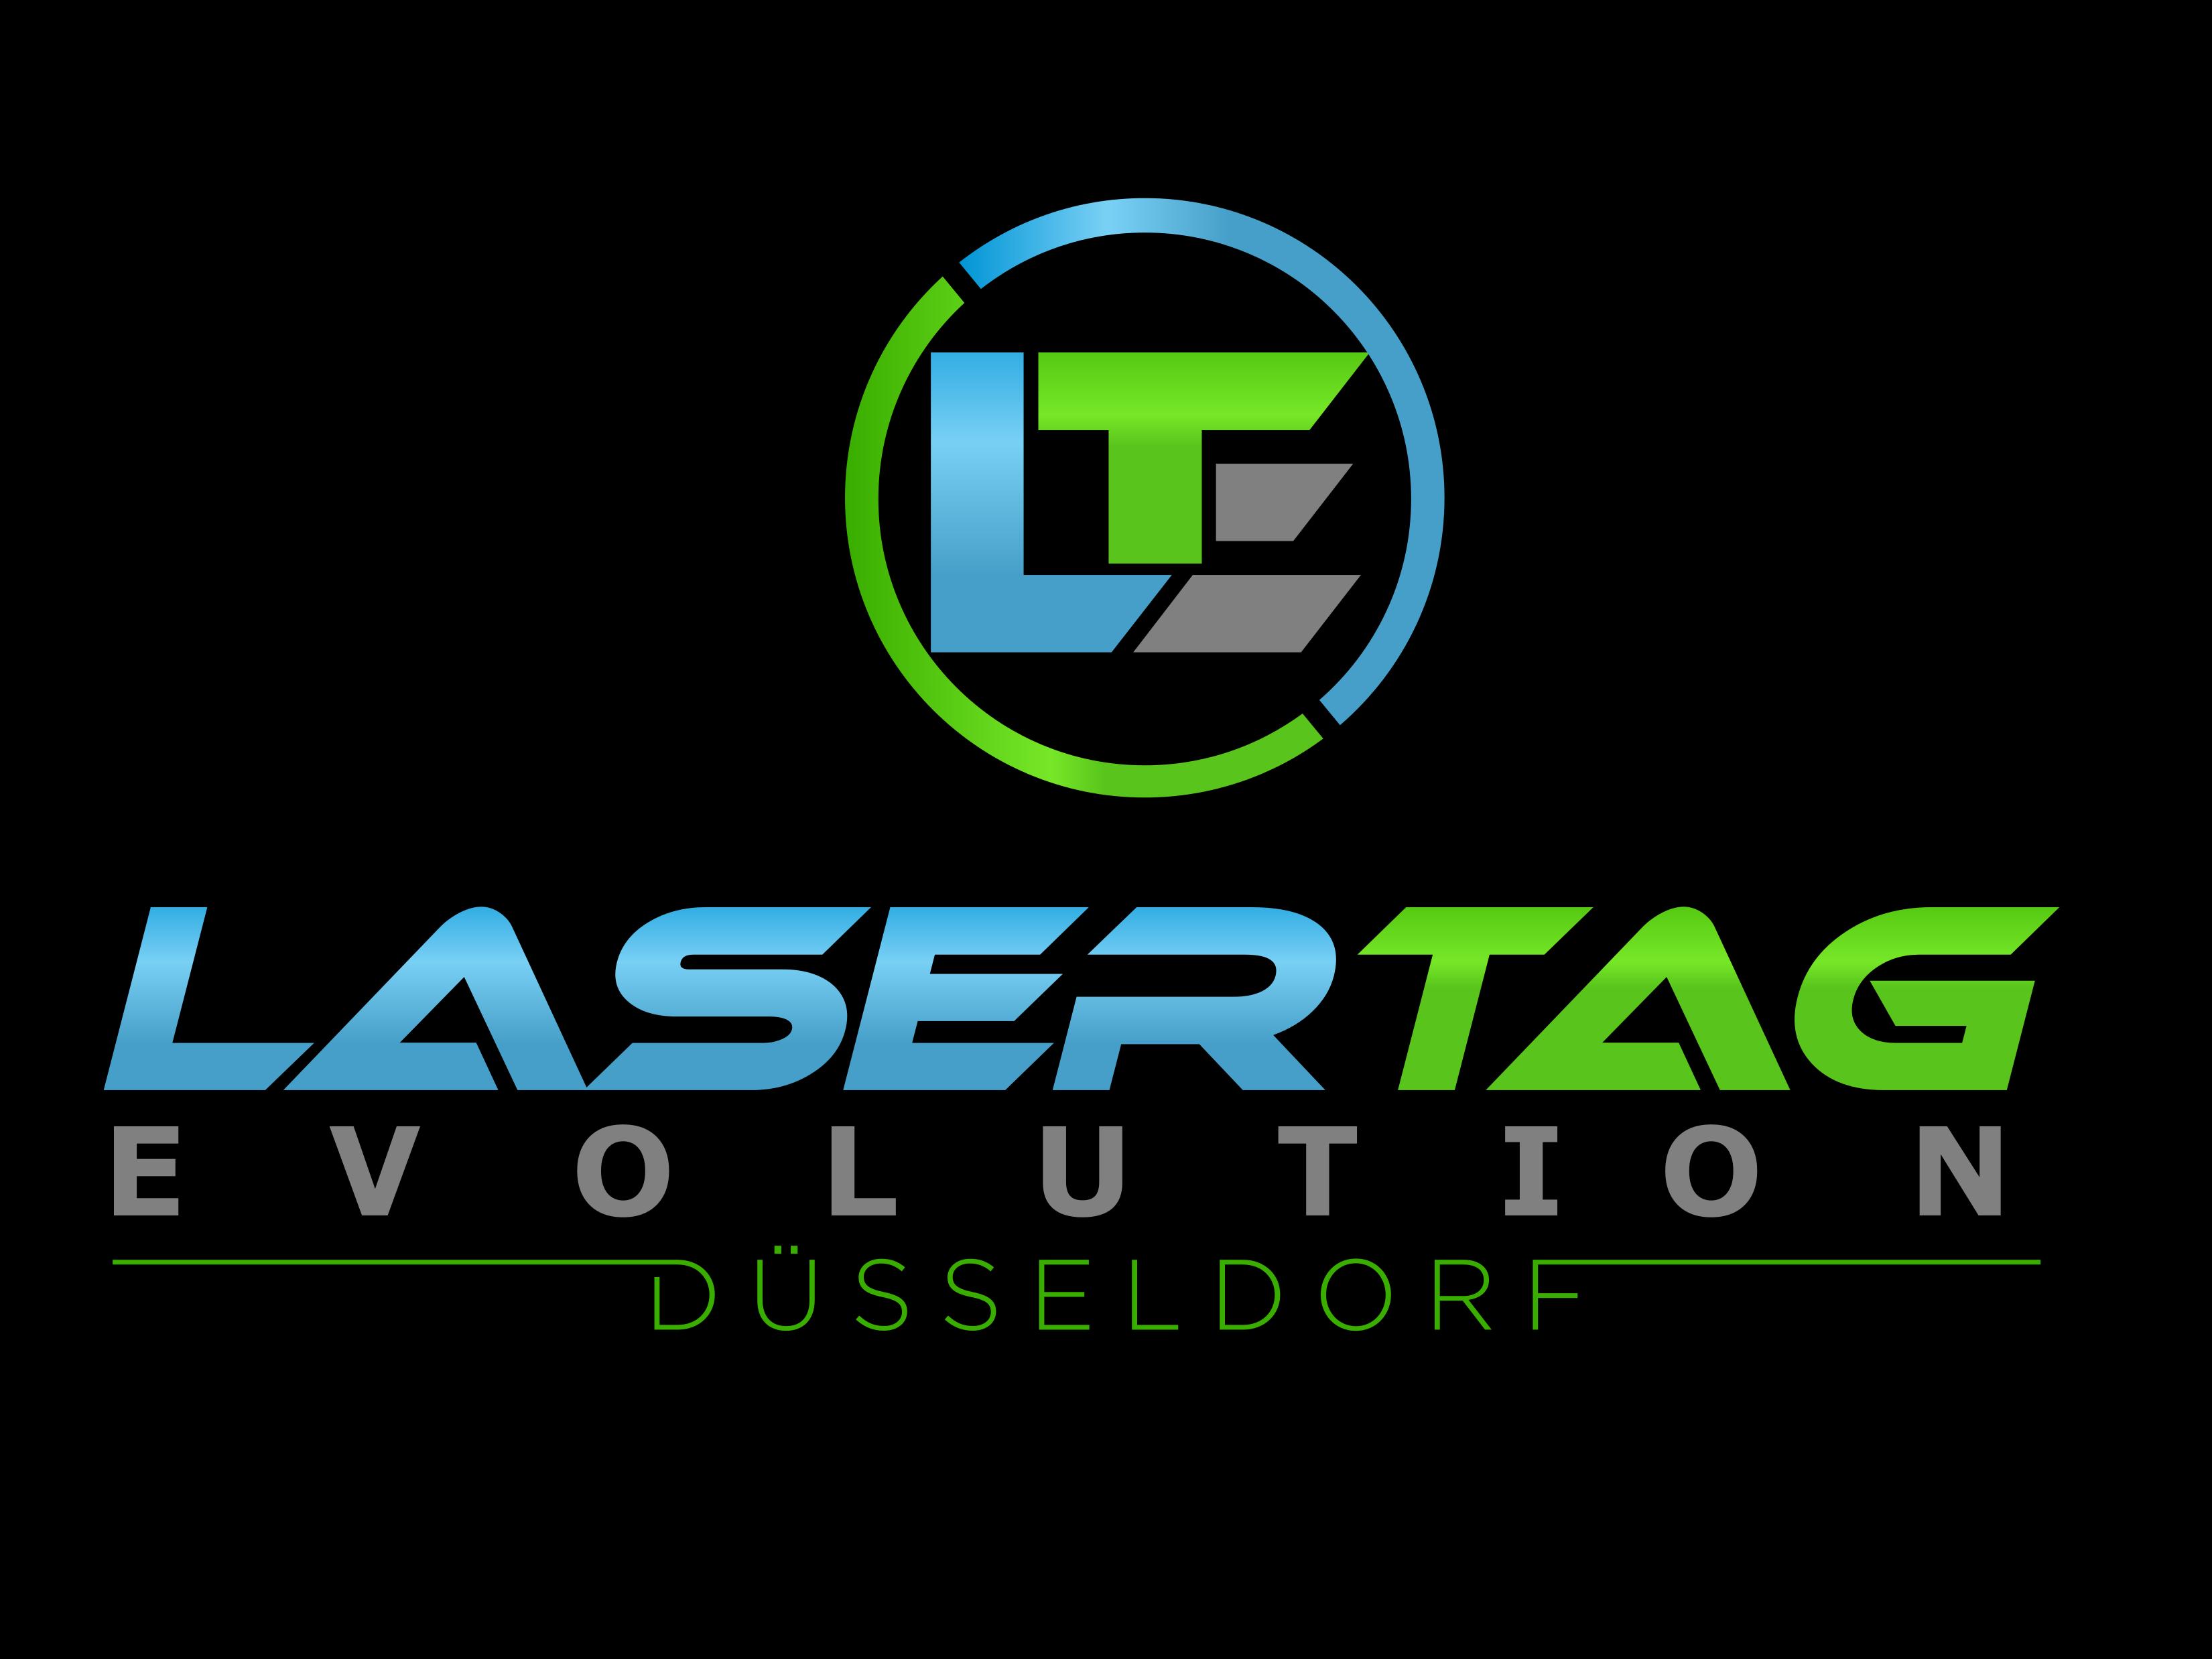 lasertag d sseldorf premium lasertag mit touchscreen phaser. Black Bedroom Furniture Sets. Home Design Ideas